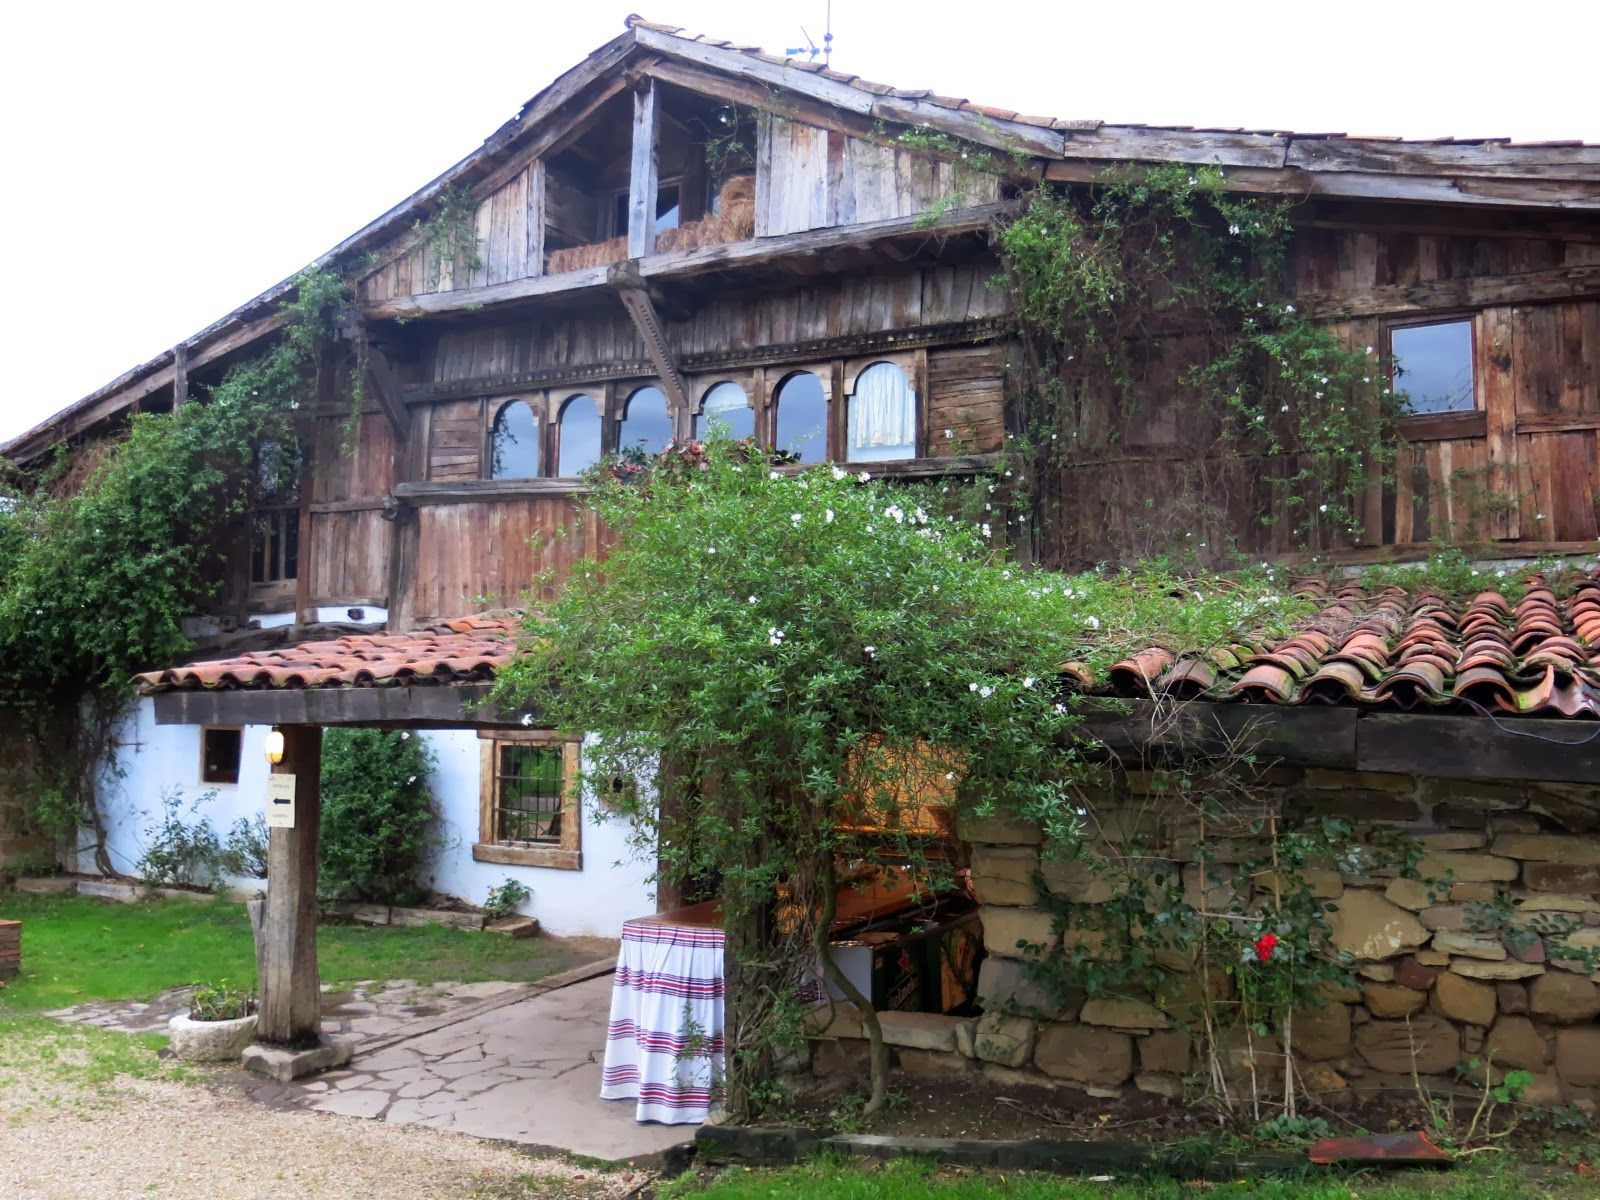 Caserios vascos gipuzkoa pinterest pa s vasco espa a y casas - Casas pais vasco ...